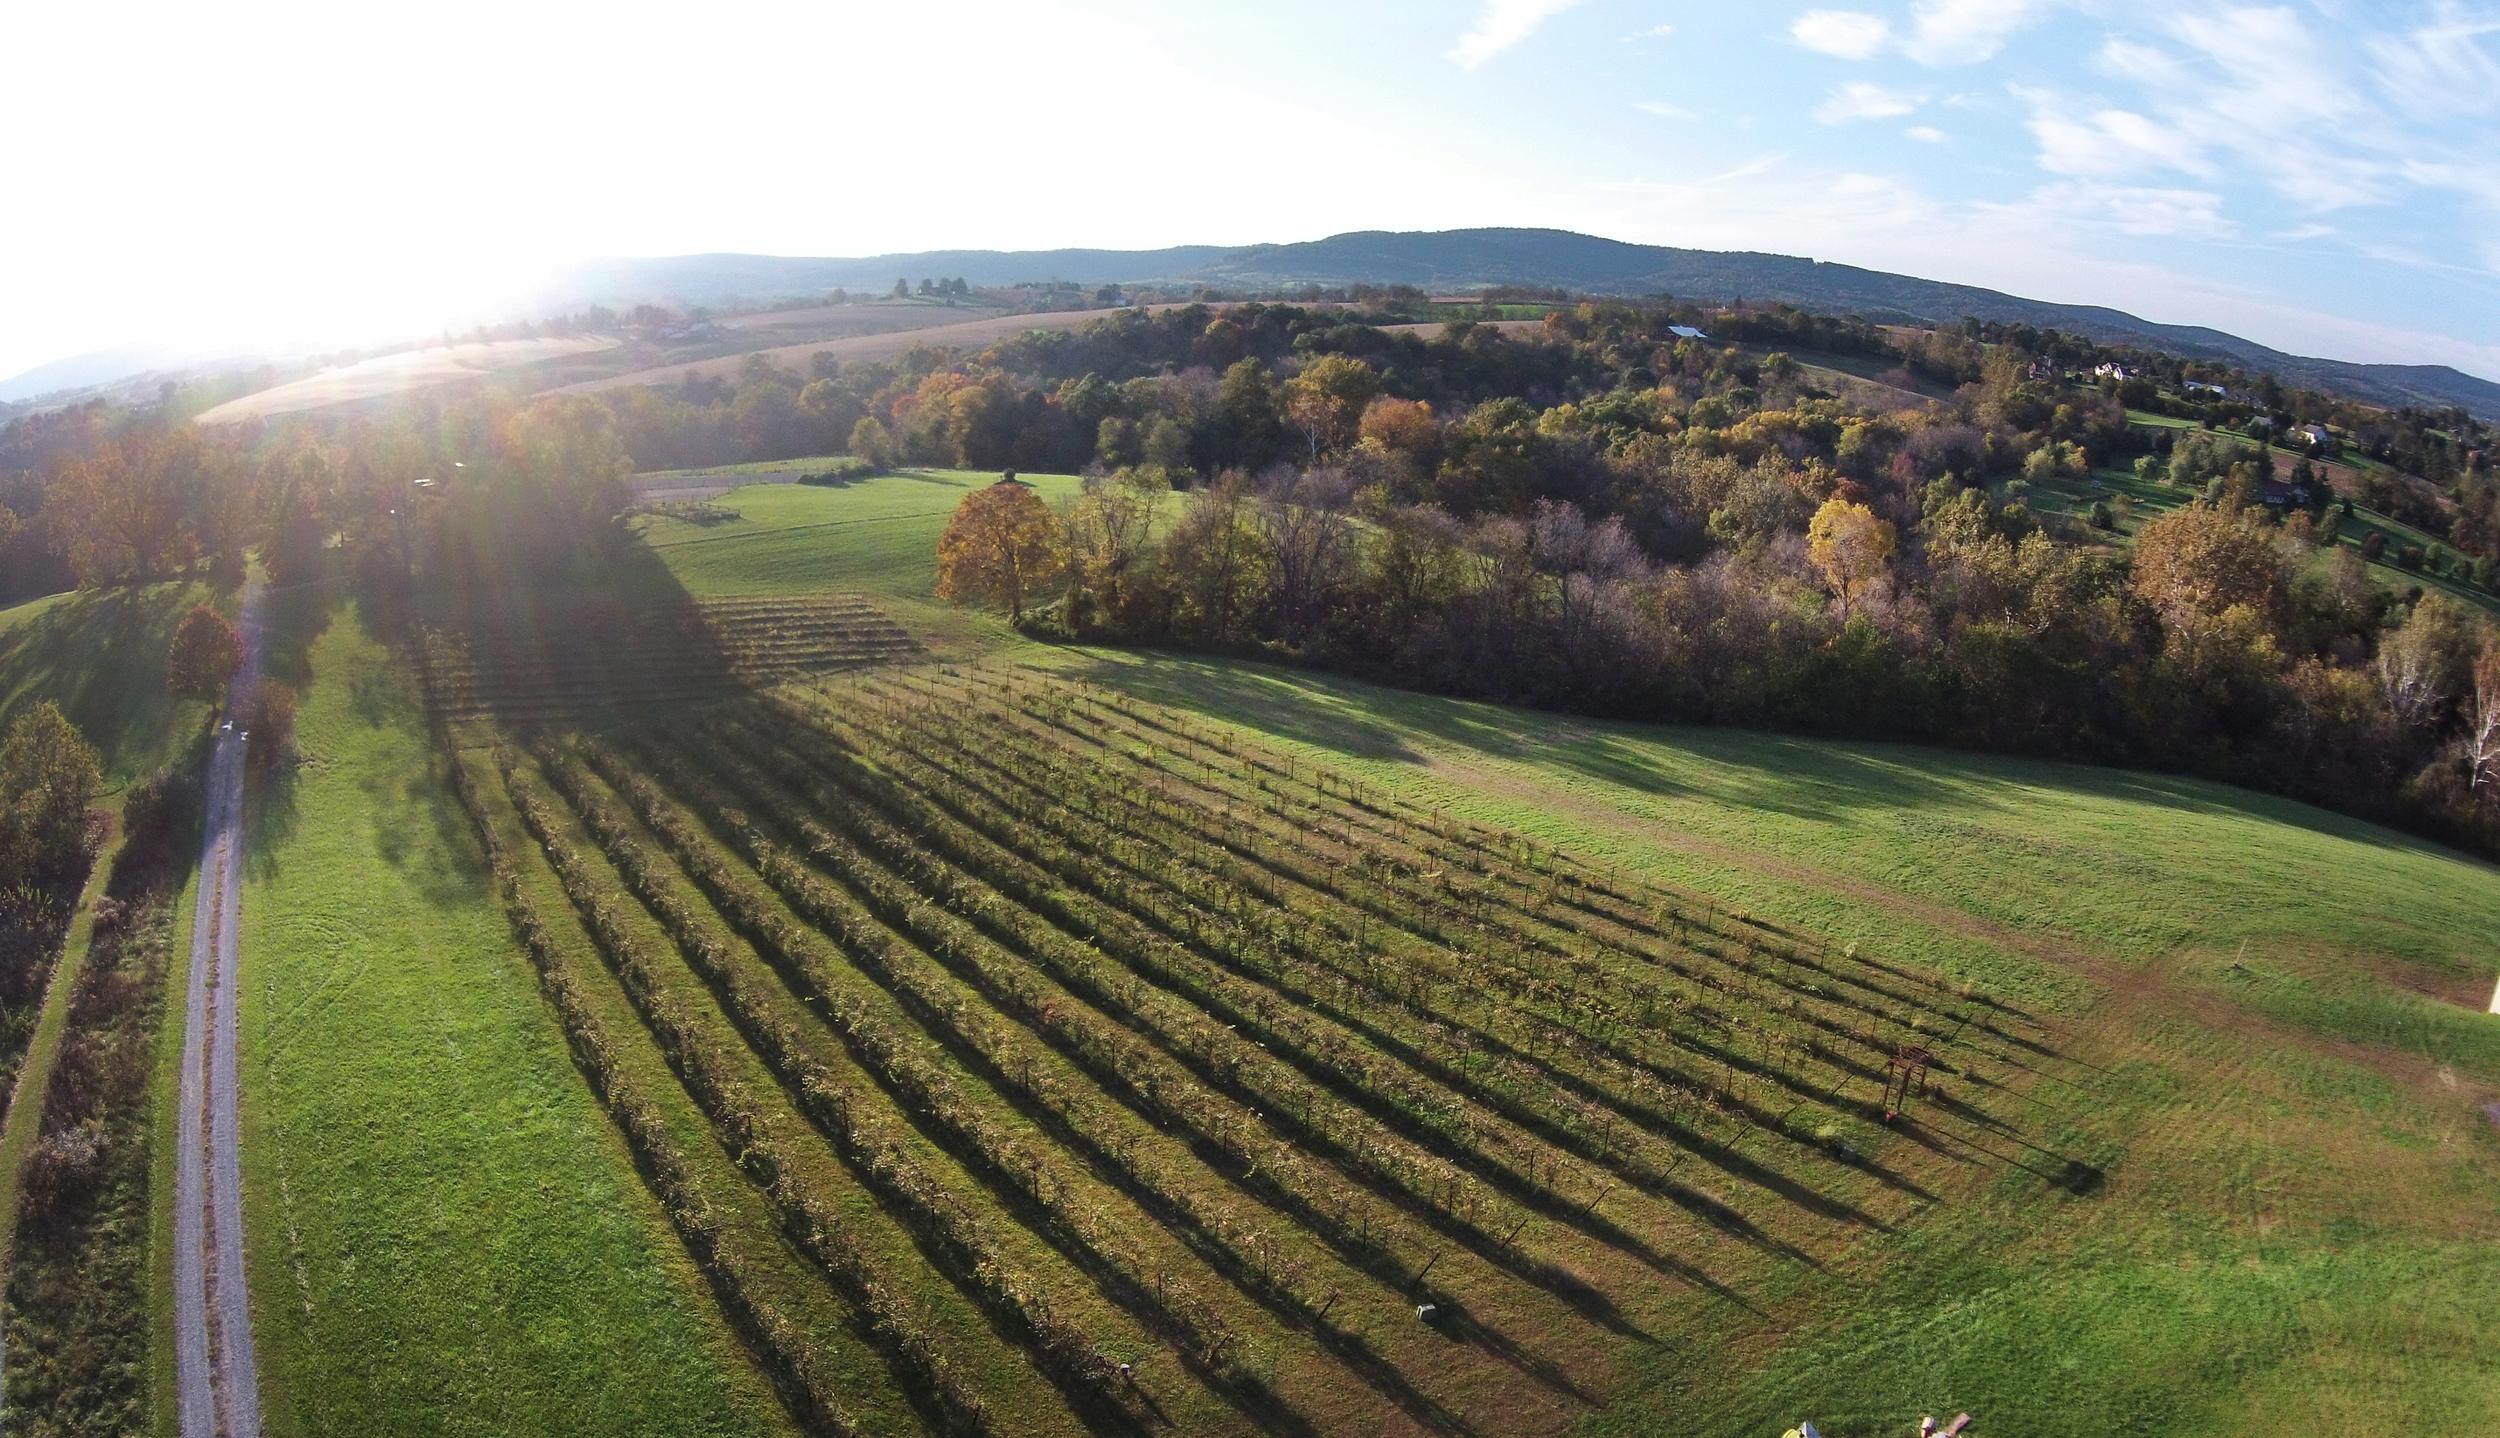 The vineyard via drone